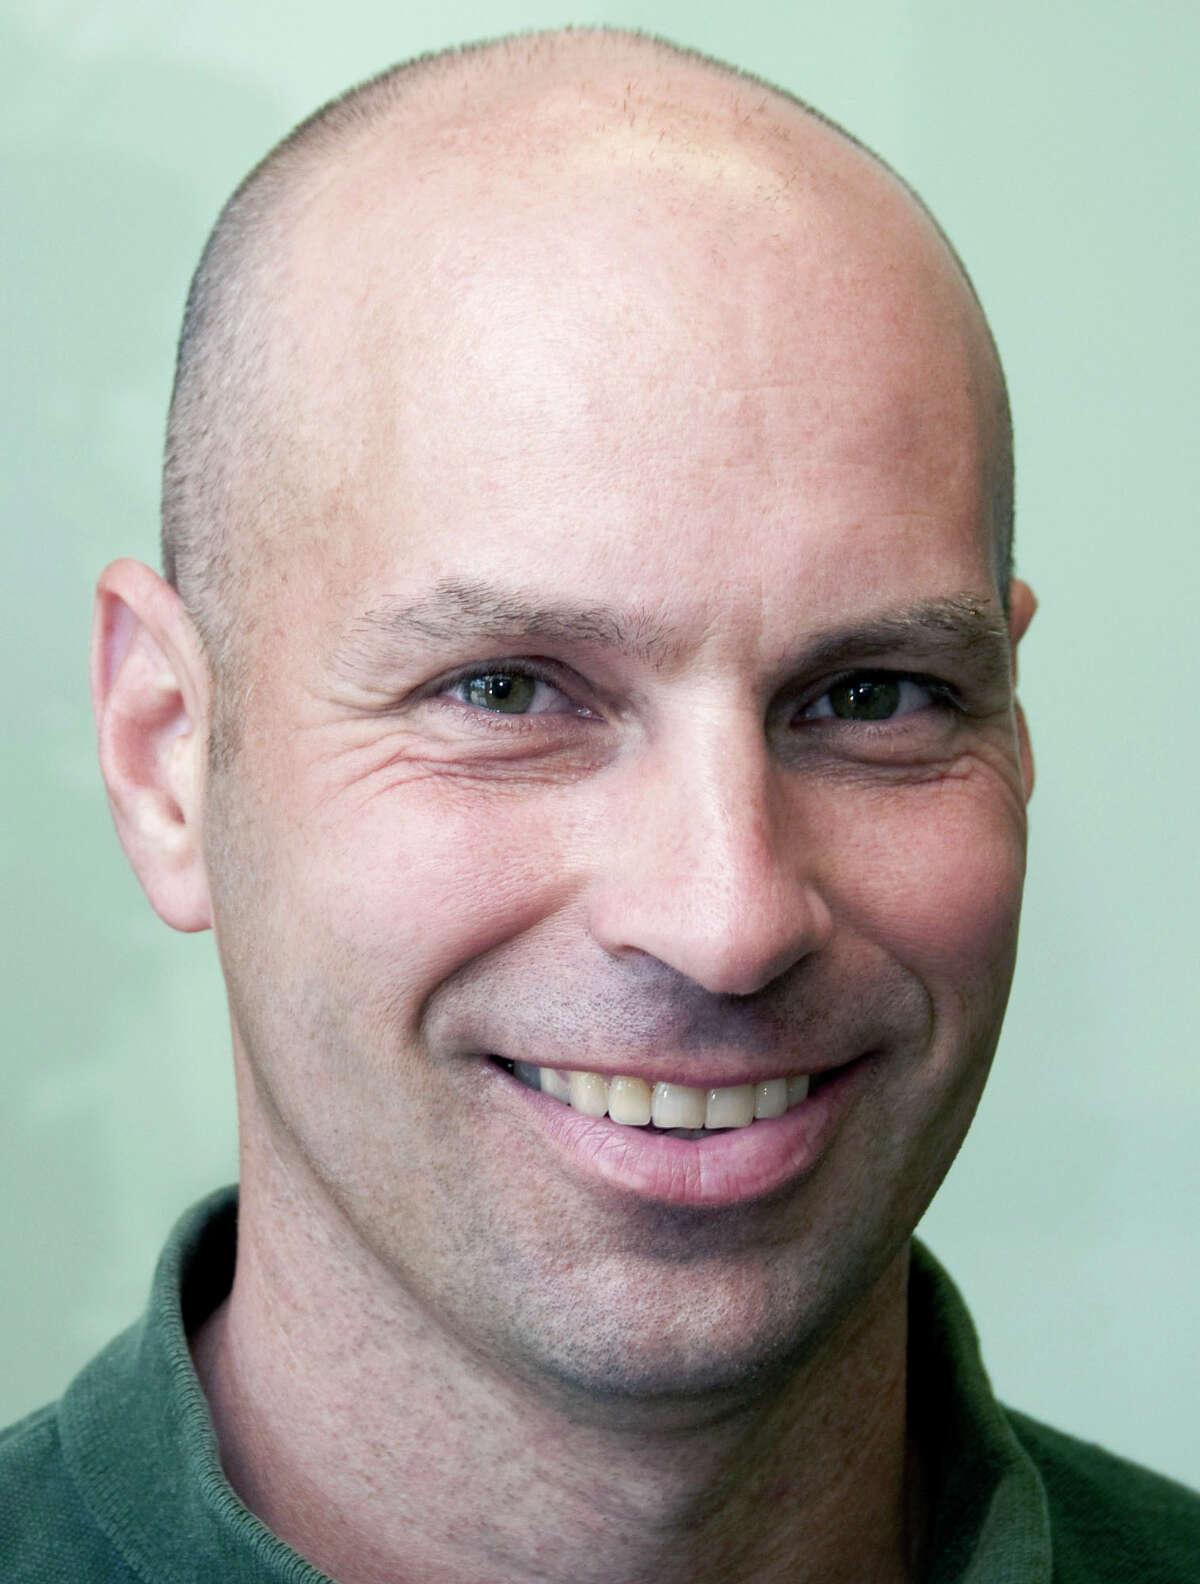 SPECTRUM/Richard Schipul for Home & Garden column, April 2012